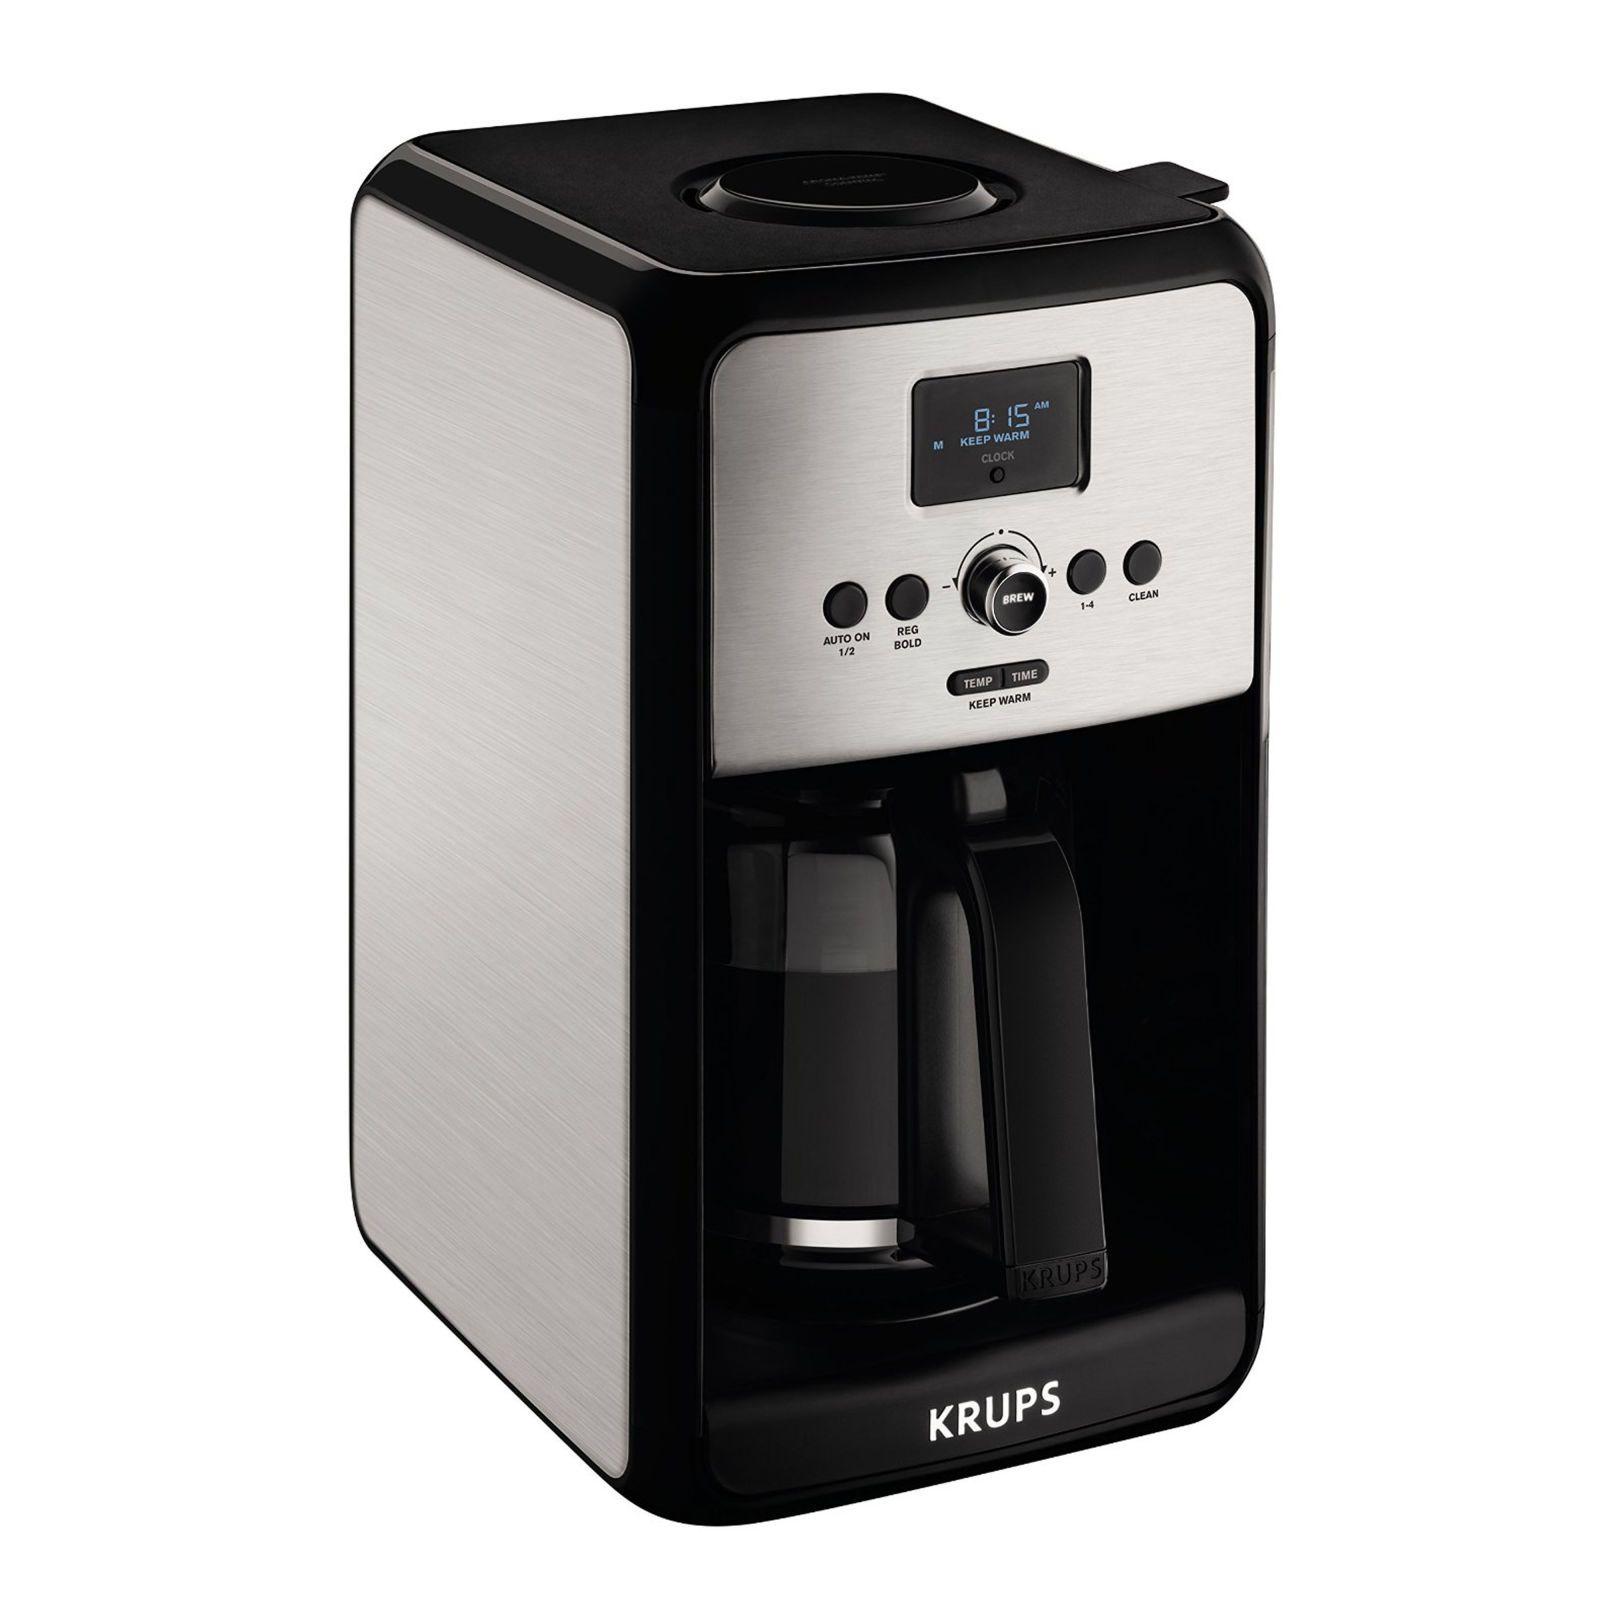 Krups savoy cup programmable coffee maker ec coffee maker